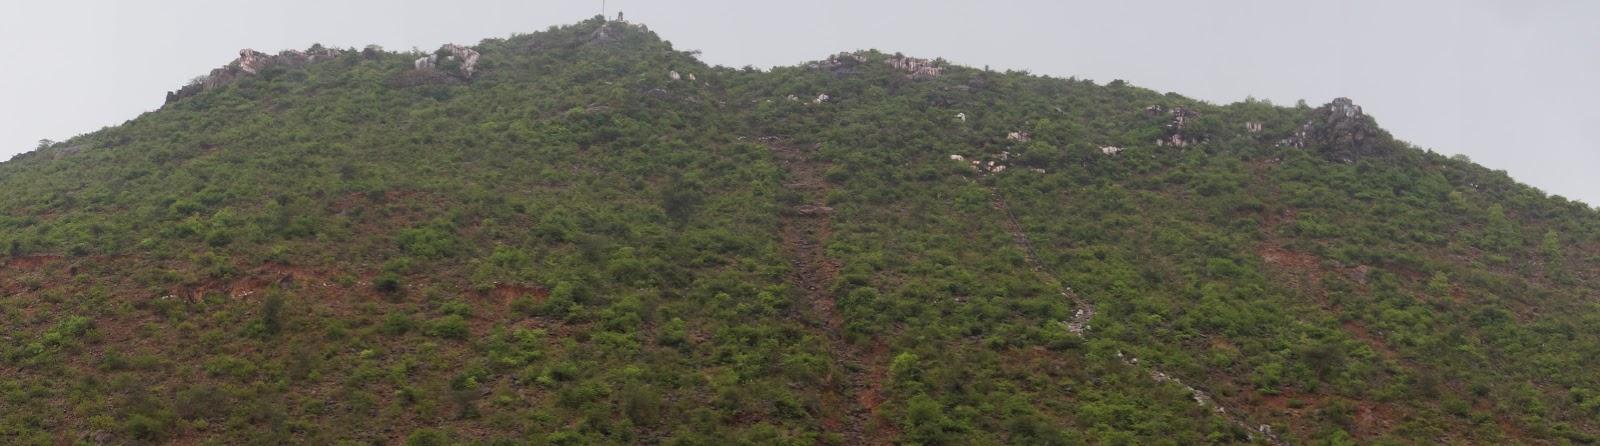 kalrayan hills hotels